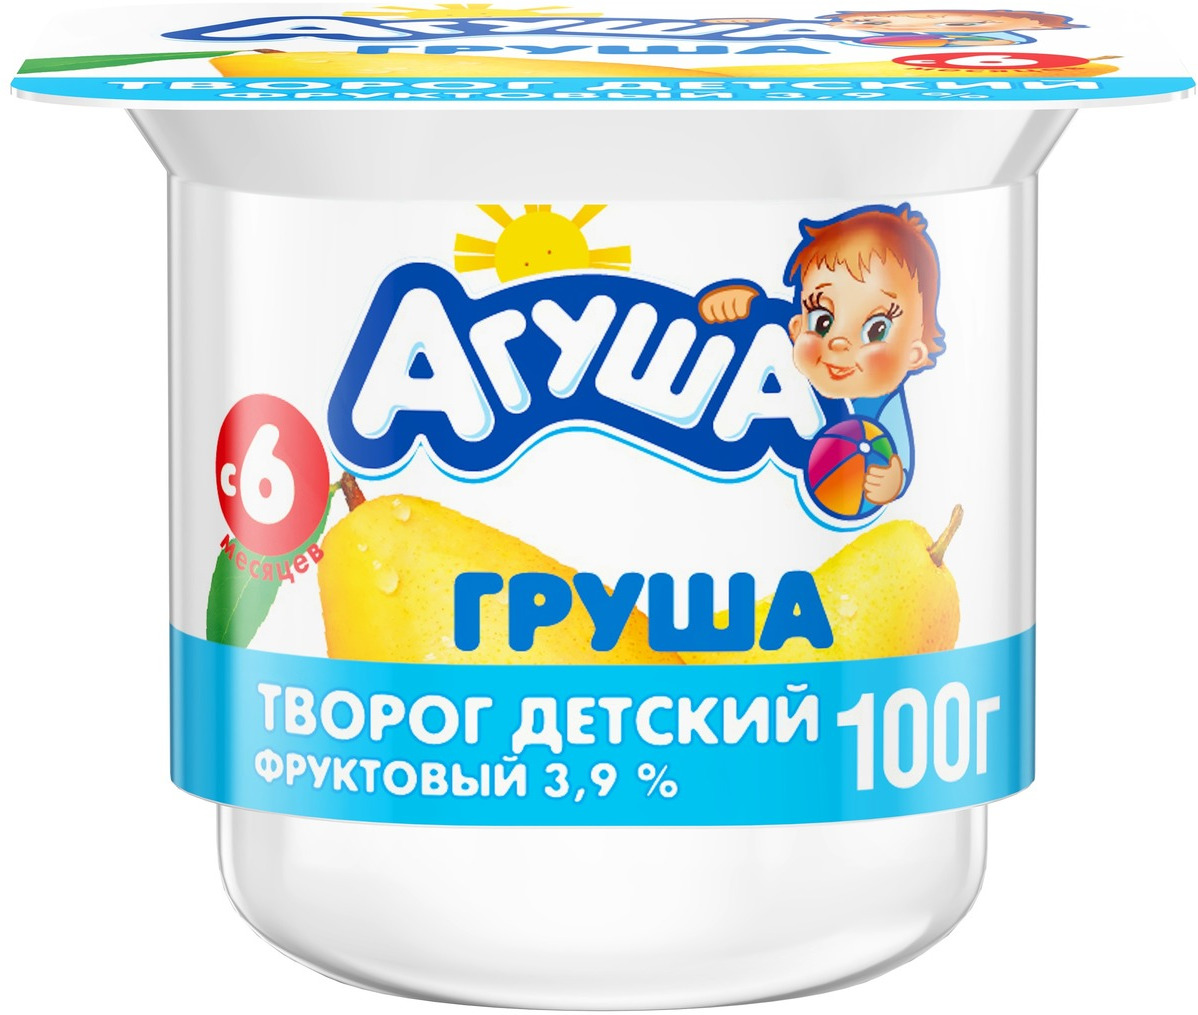 Творог фруктовый 3,9% с 6 месяцев Агуша Груша, 100 г